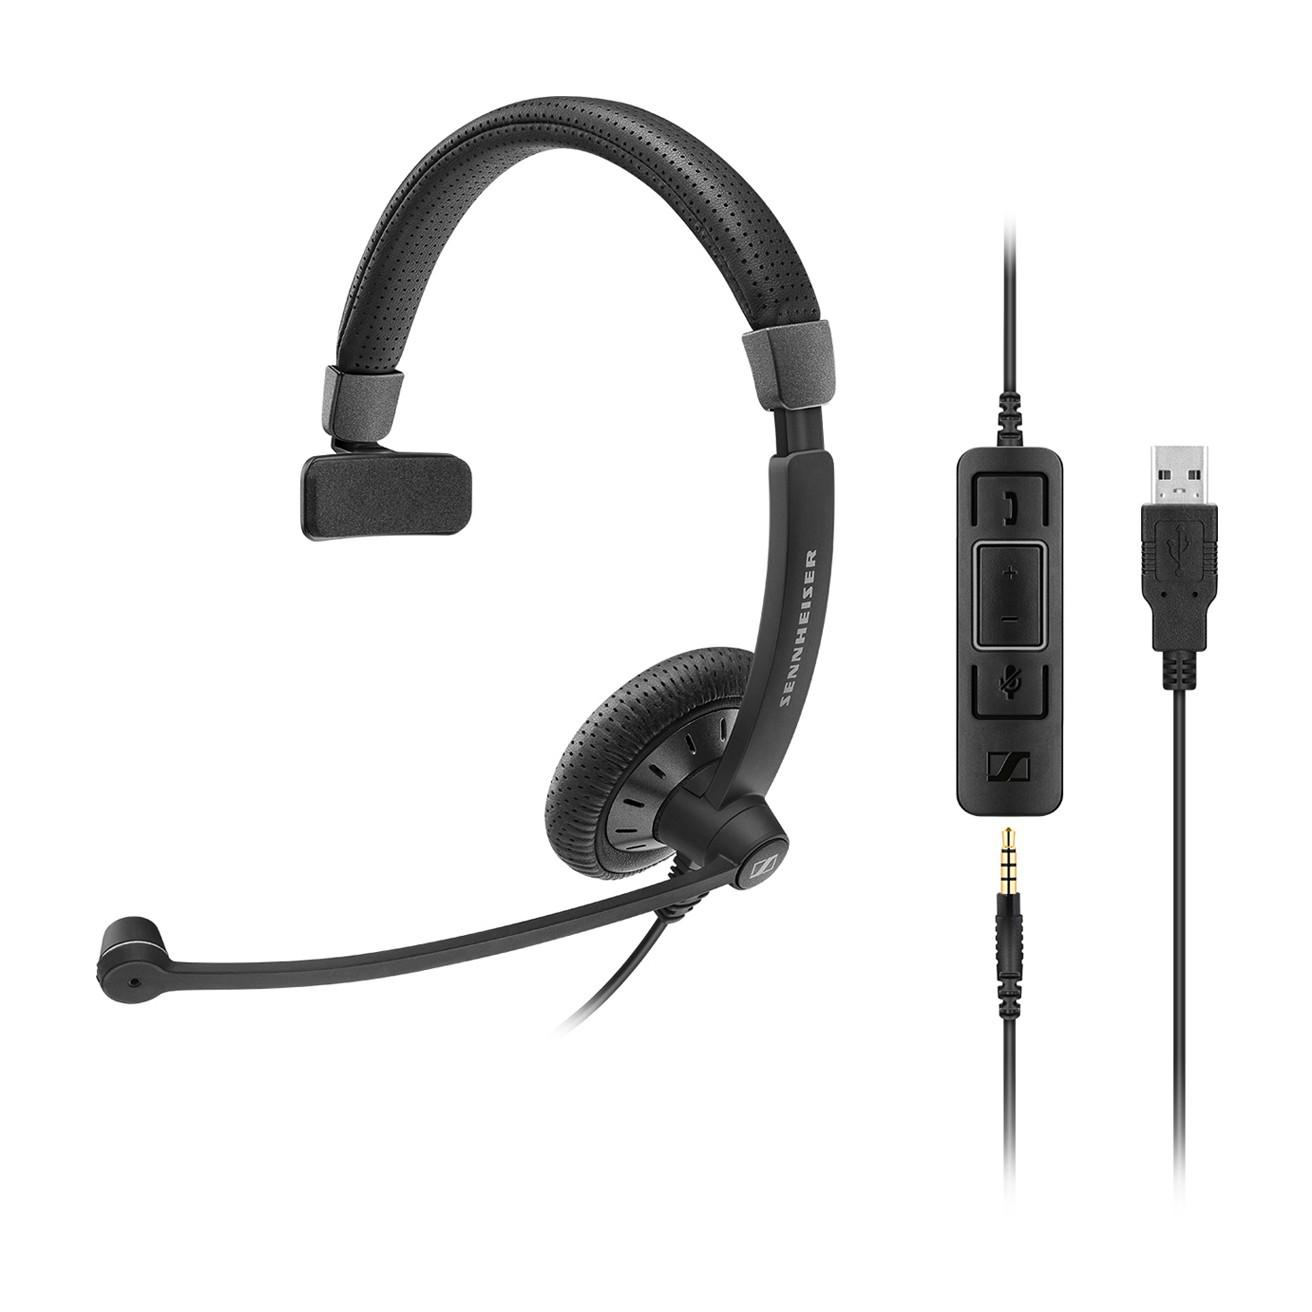 Sennheiser SC45 Mono USB CTRL Headset